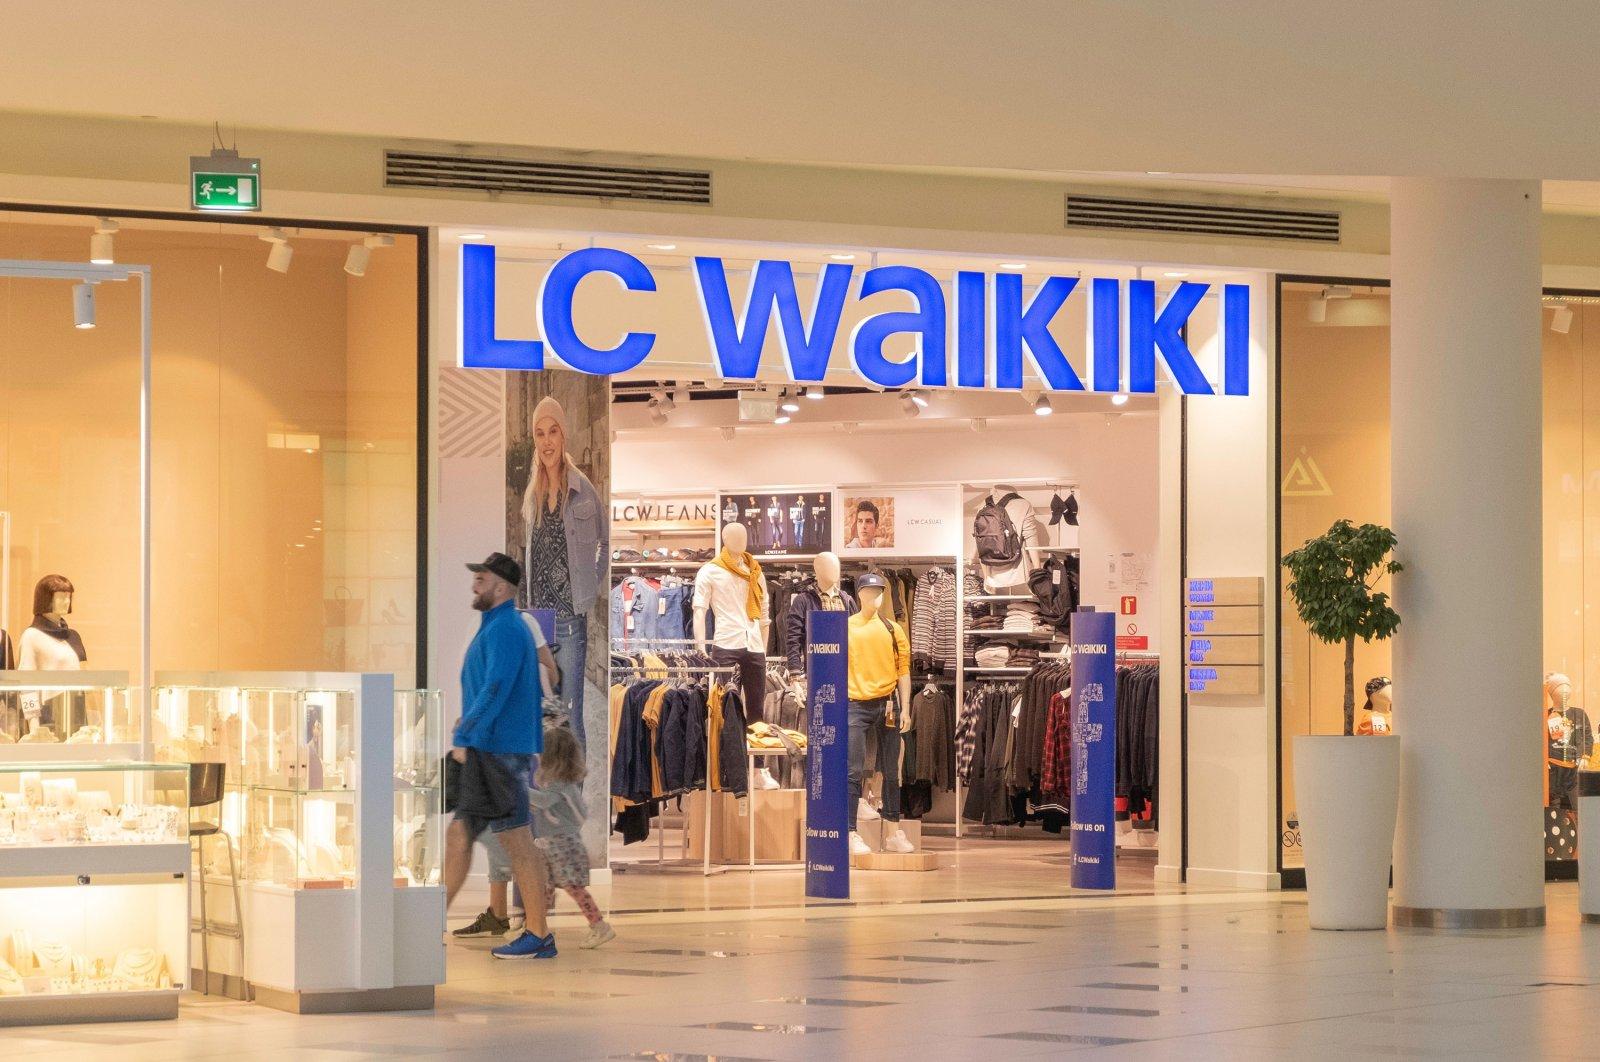 An LC Waikiki store in a mall, Sofia, Bulgaria, Oct. 20, 2019. (Shutterstock Photo by Elena Milenova)